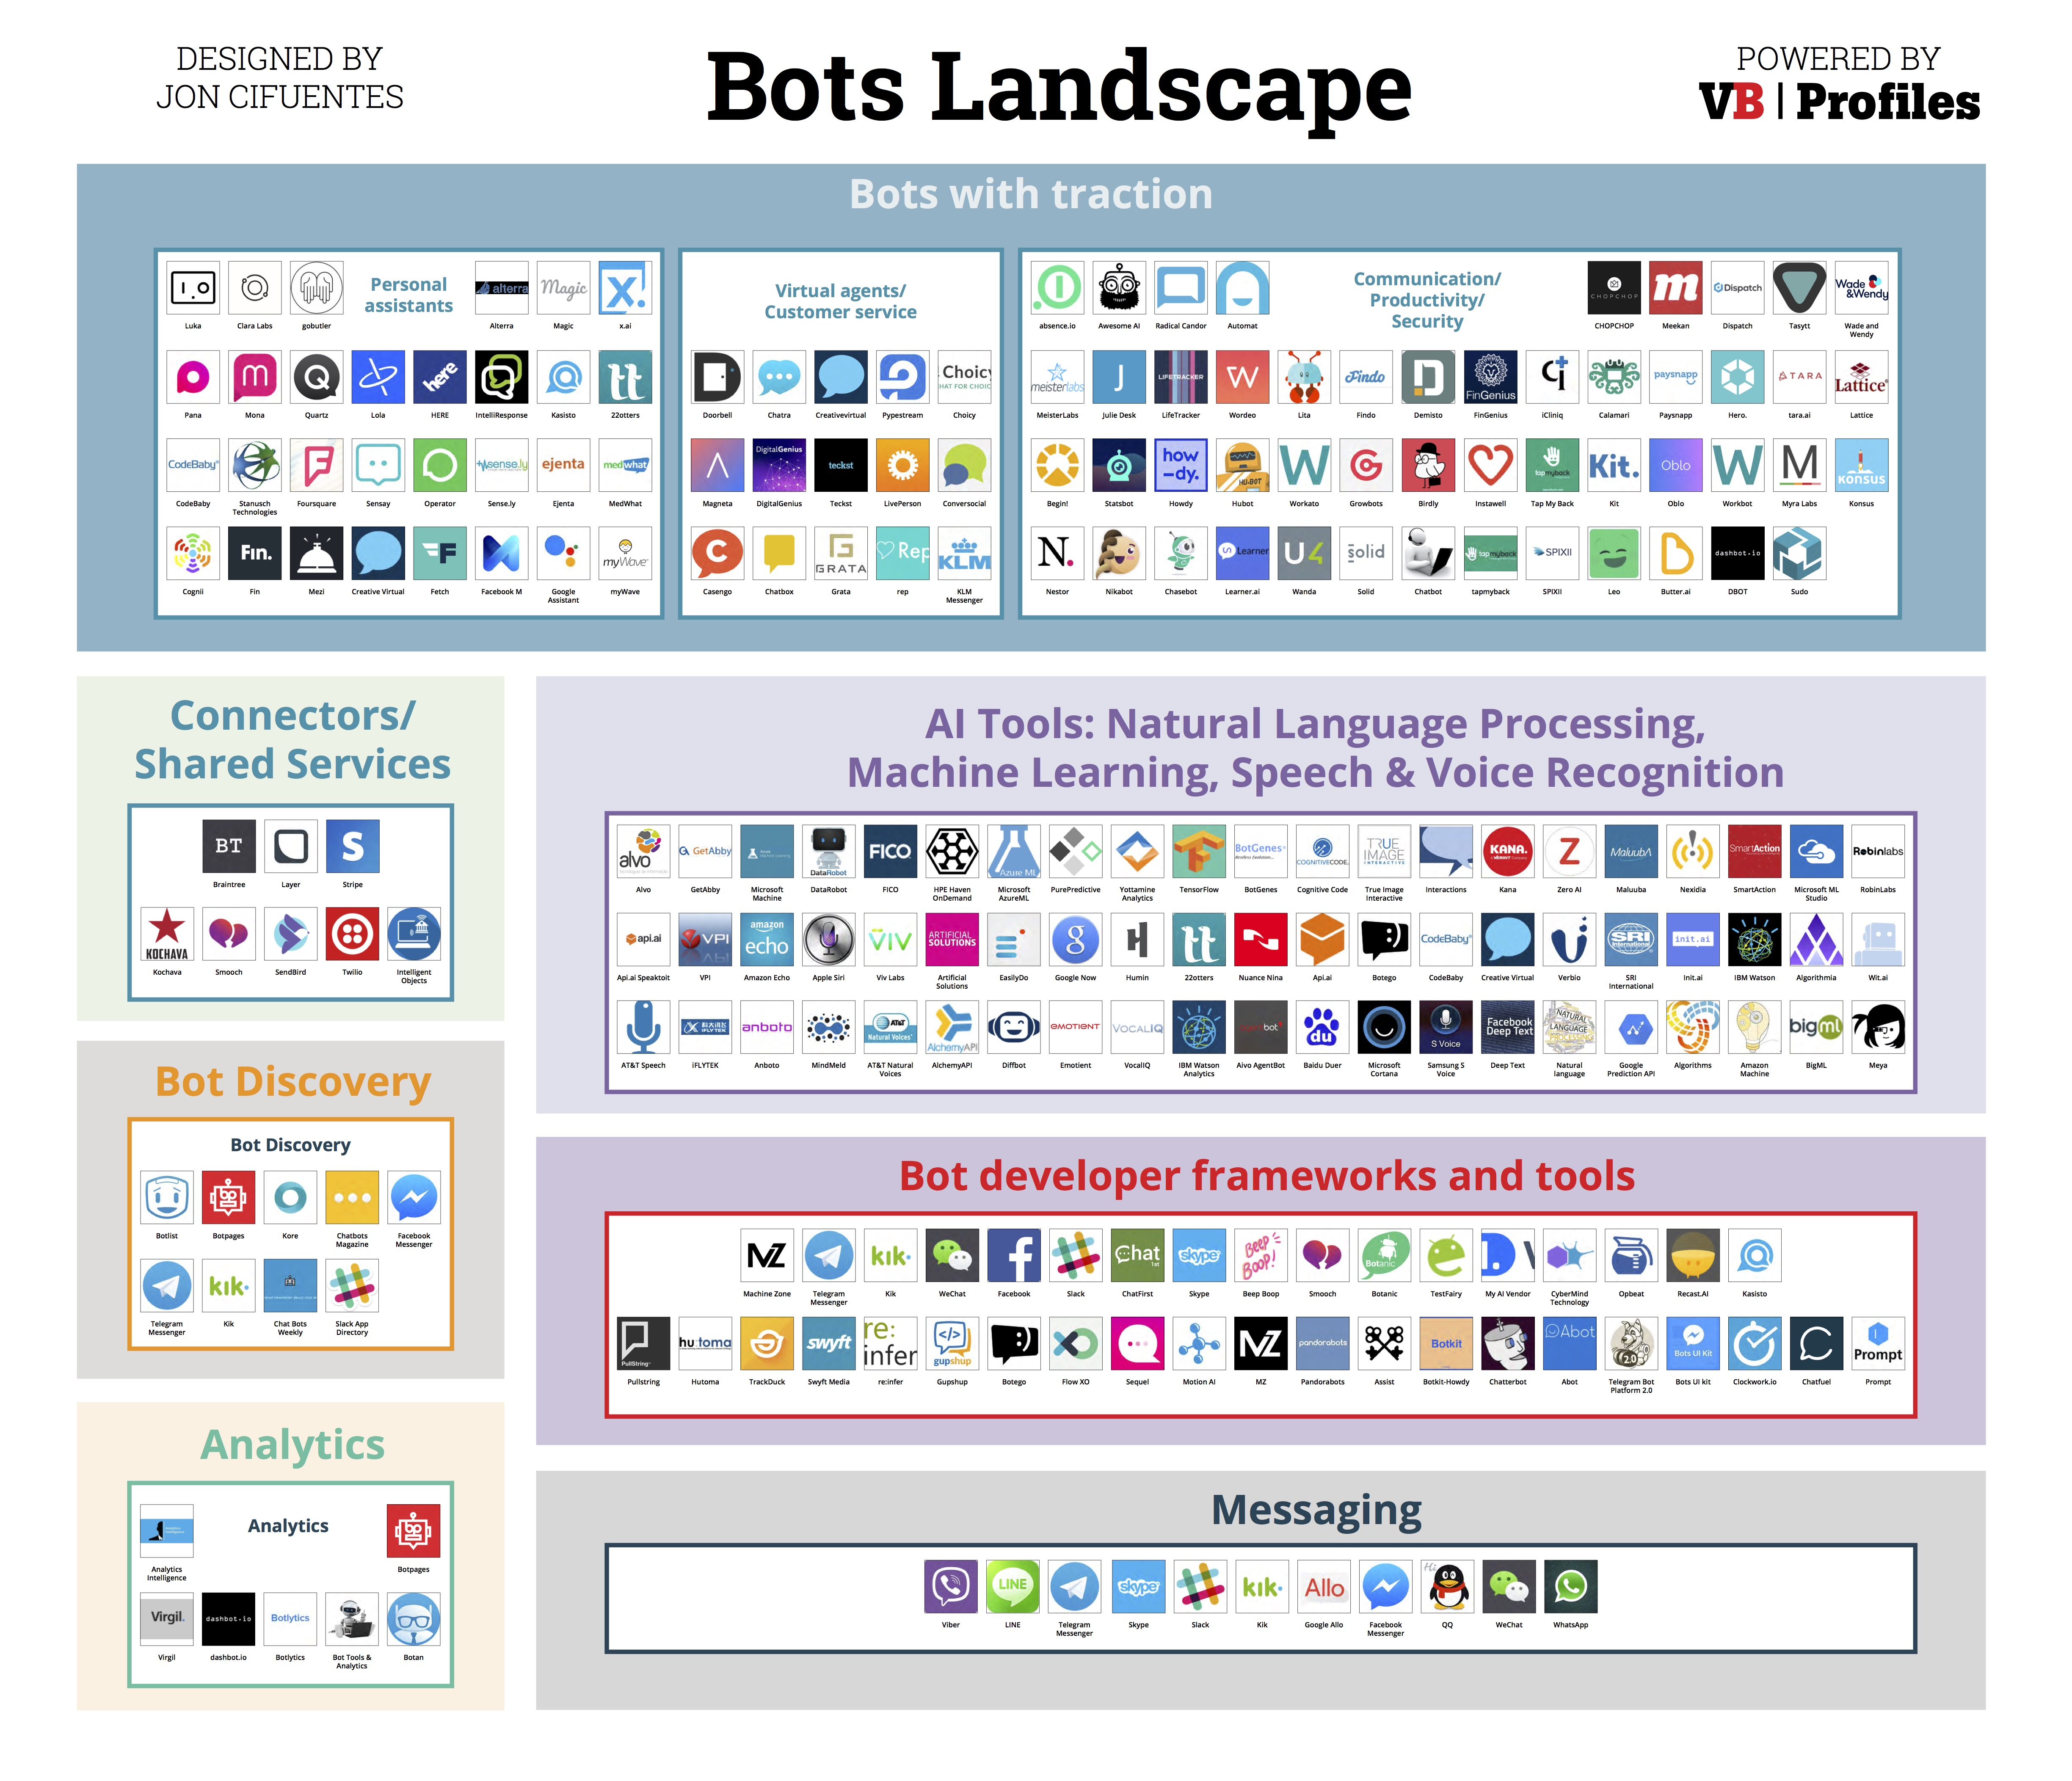 Introducing The Bots Landscape 170 Companies 4 Billion